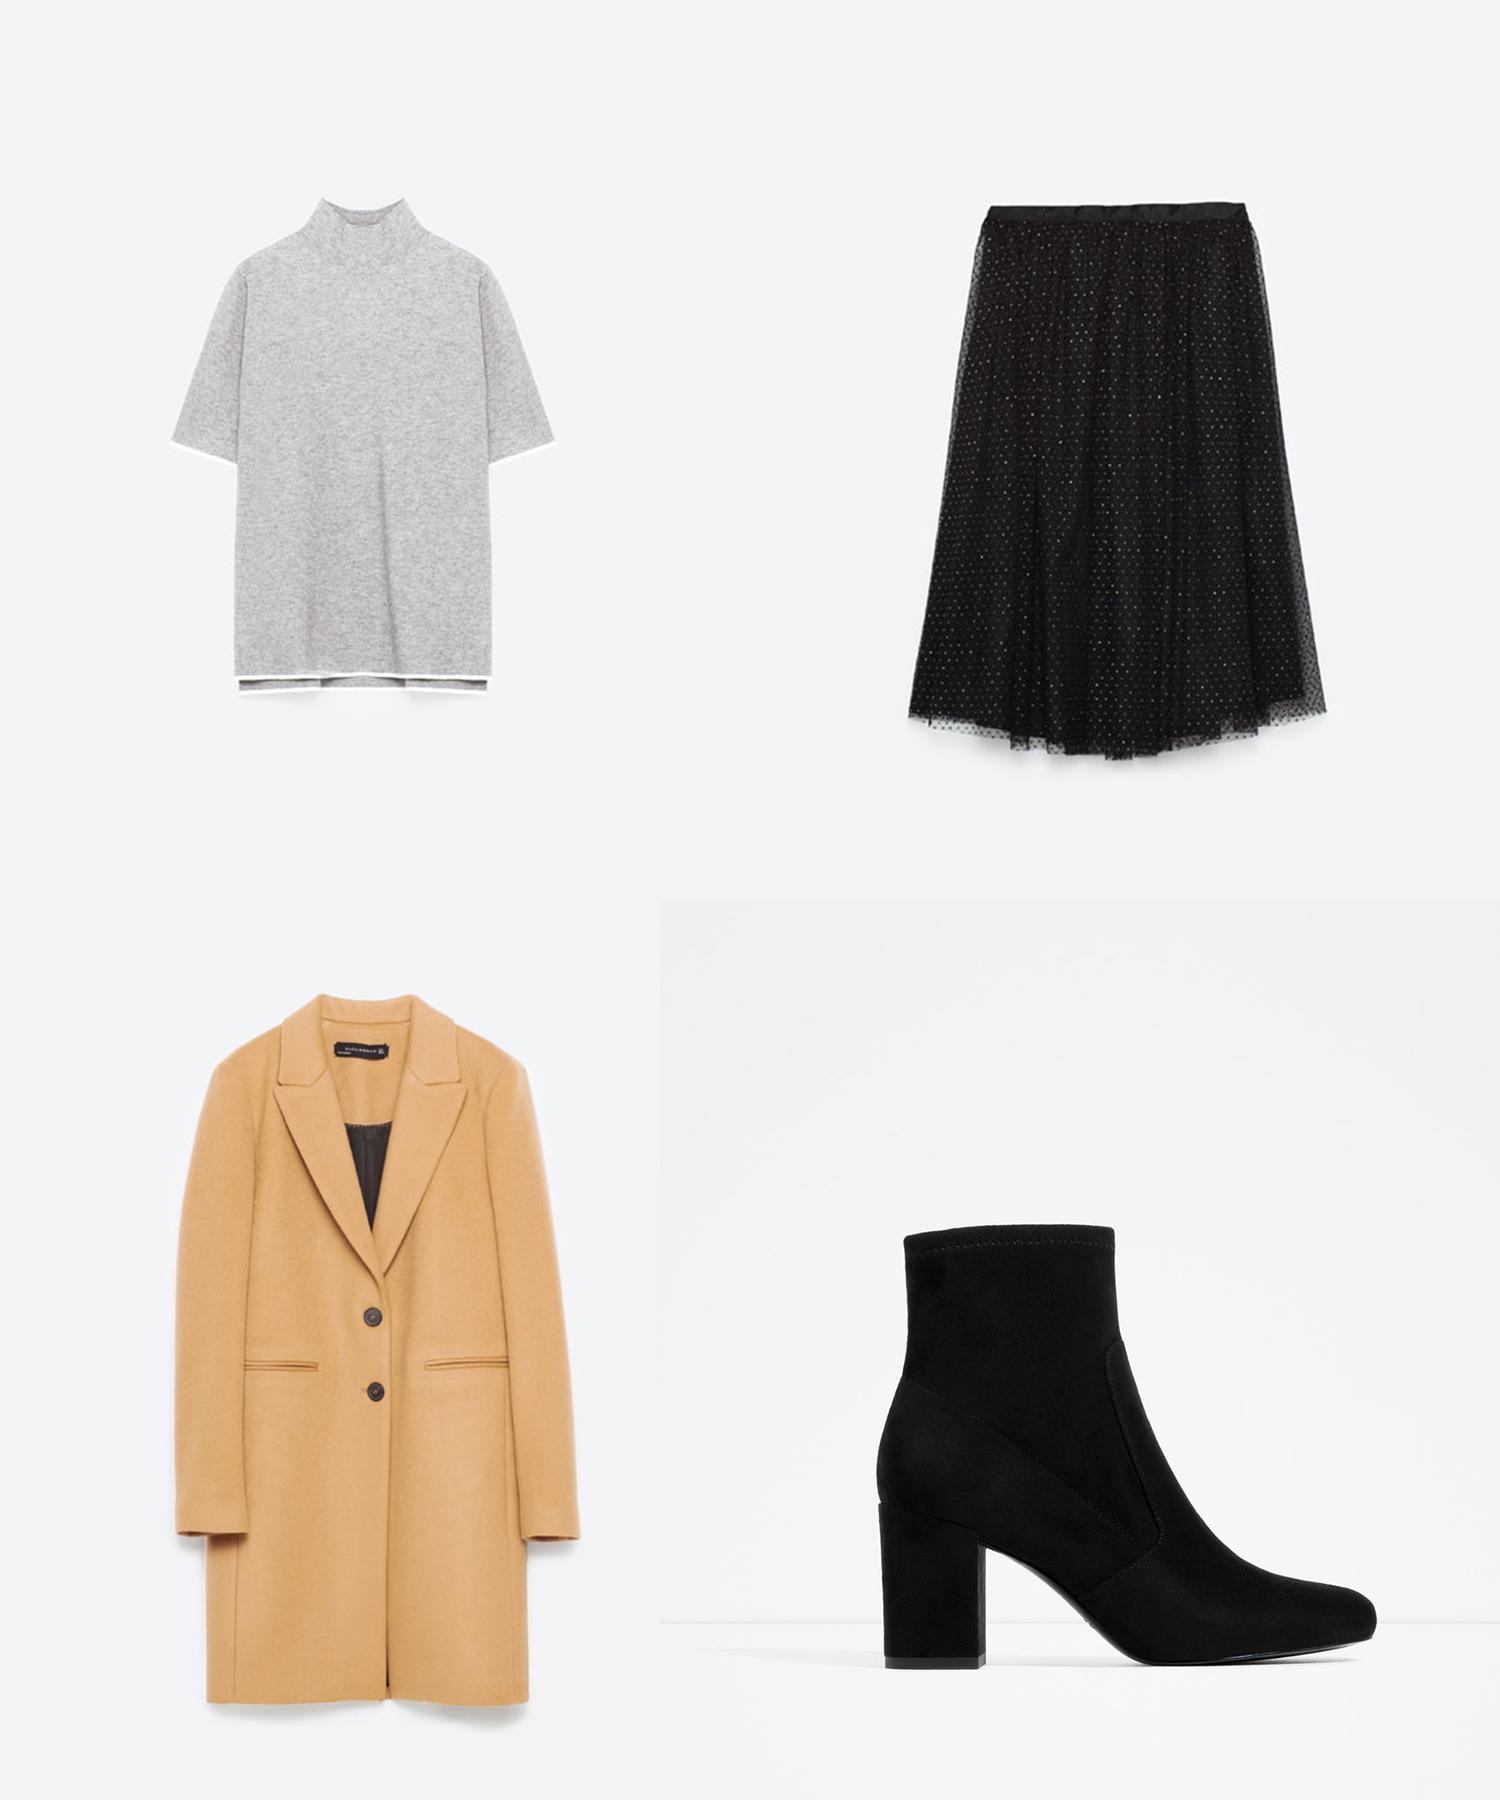 Turtleneck Sweater   ($40)   //     Tulle Skirt   ($50)   //     Masculine Coat in Camel   ($190)   //     Elastic High Heel Ankle Boots   ($60)